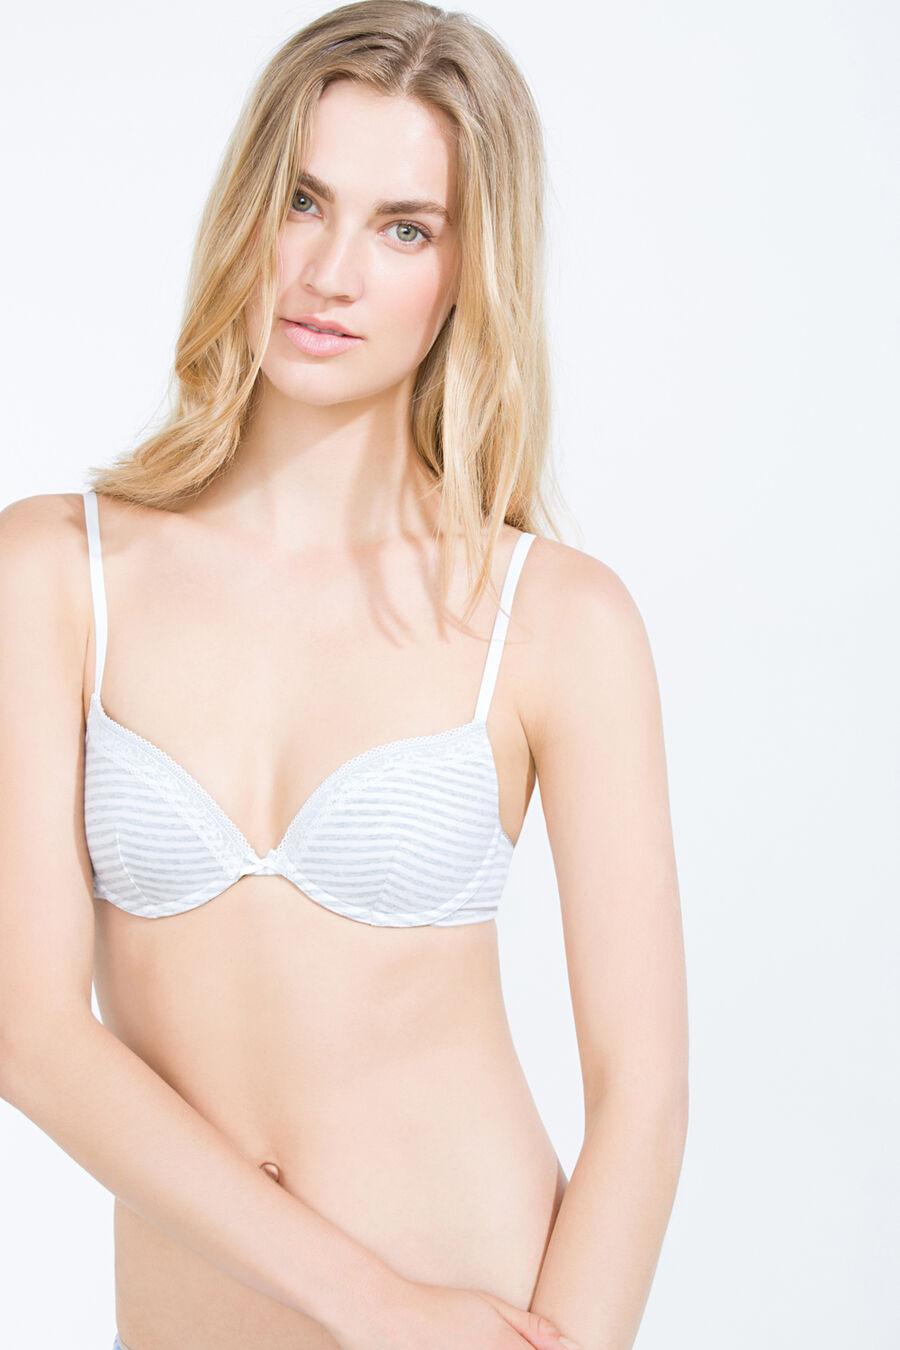 Padded cotton bra